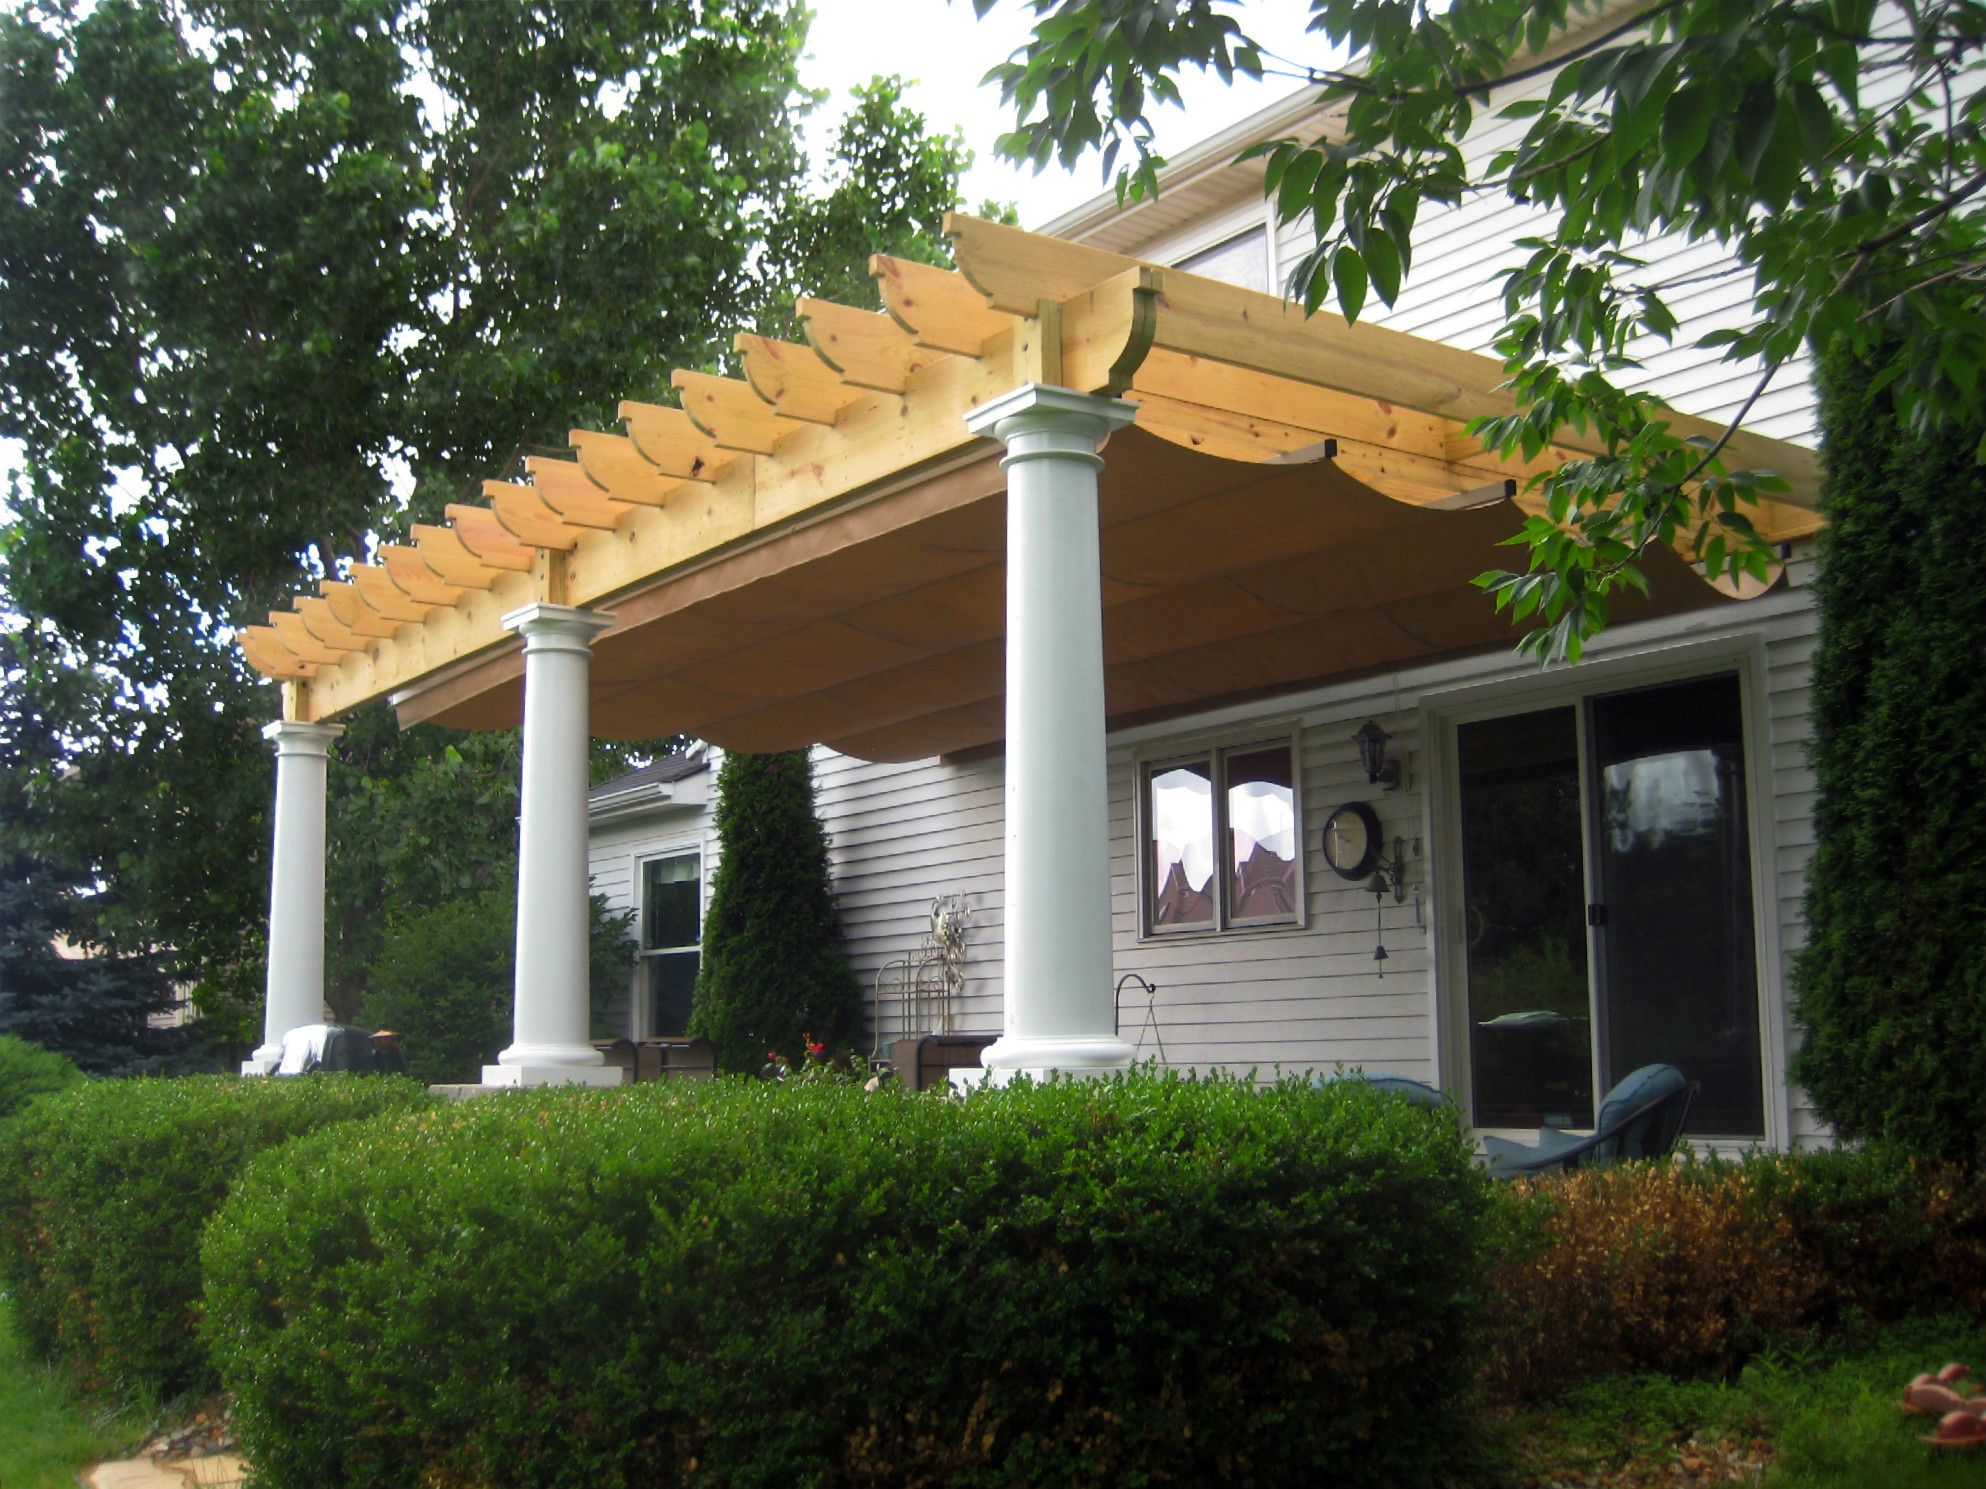 Pergola Design With Canopy By Barrington Il Pergola Builder Pergola Designs Design